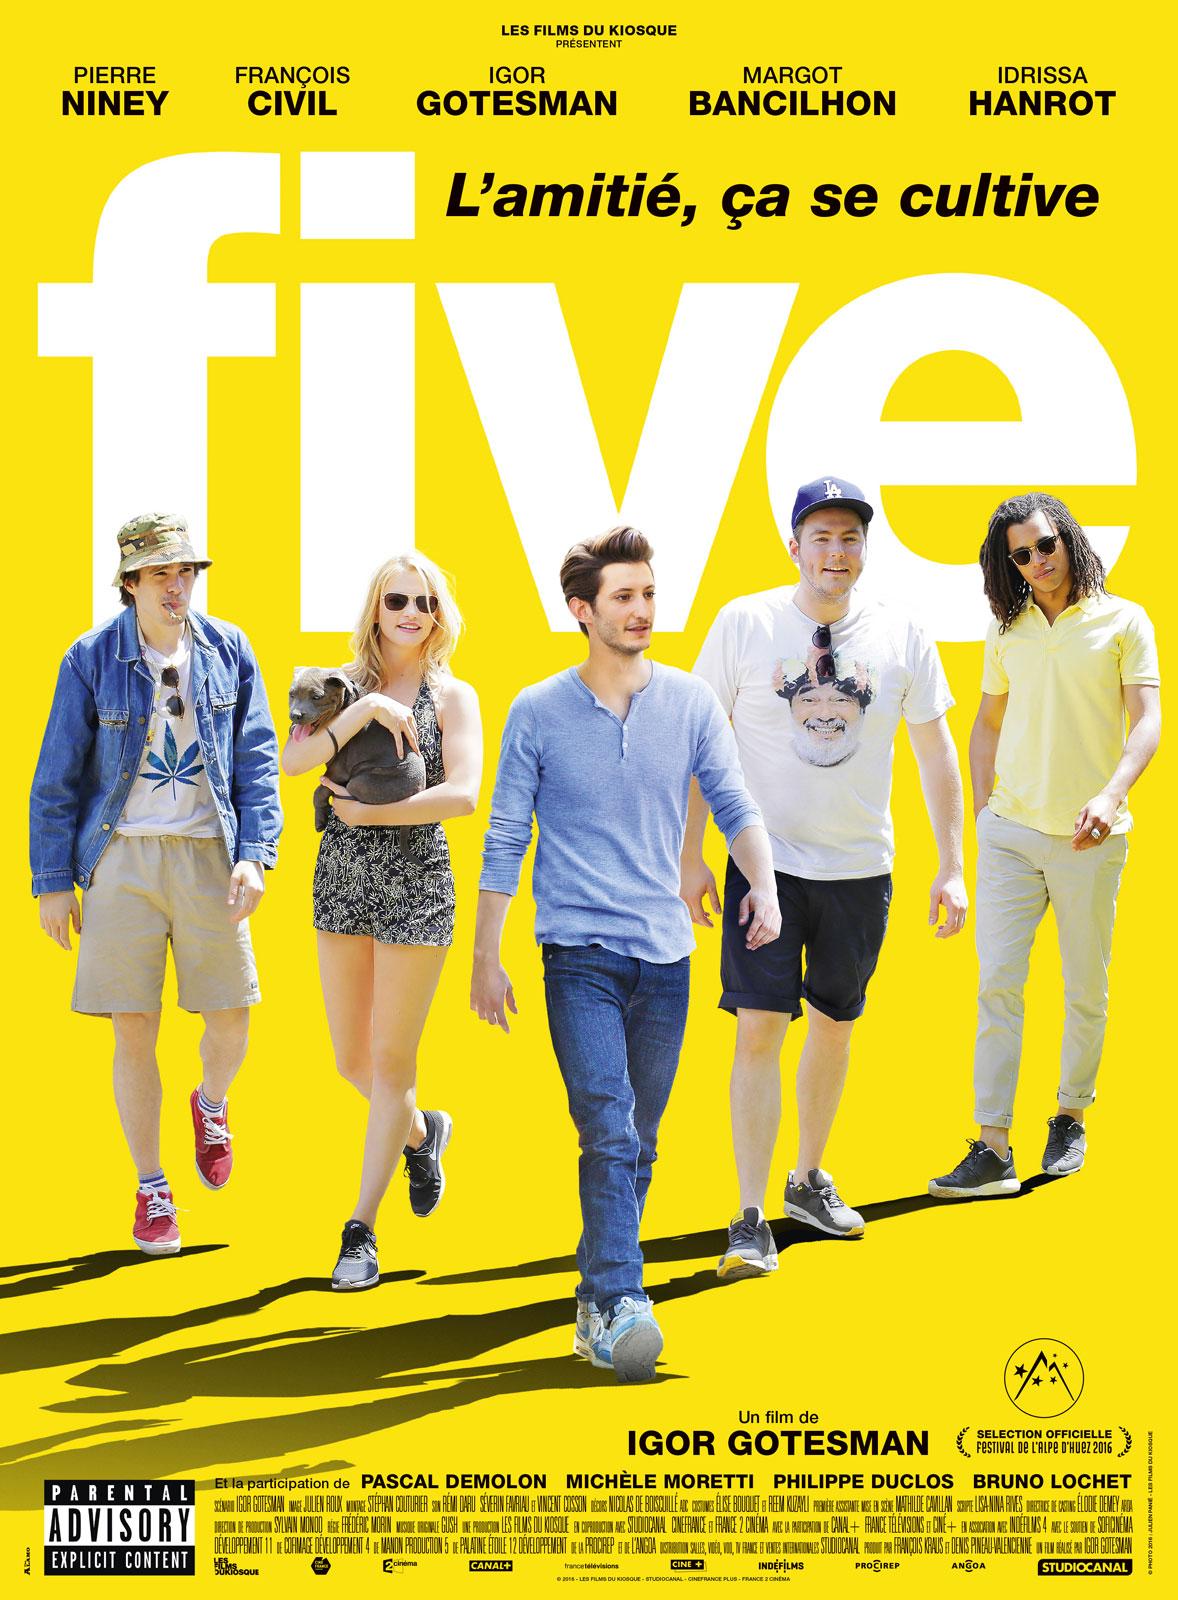 Five ddl